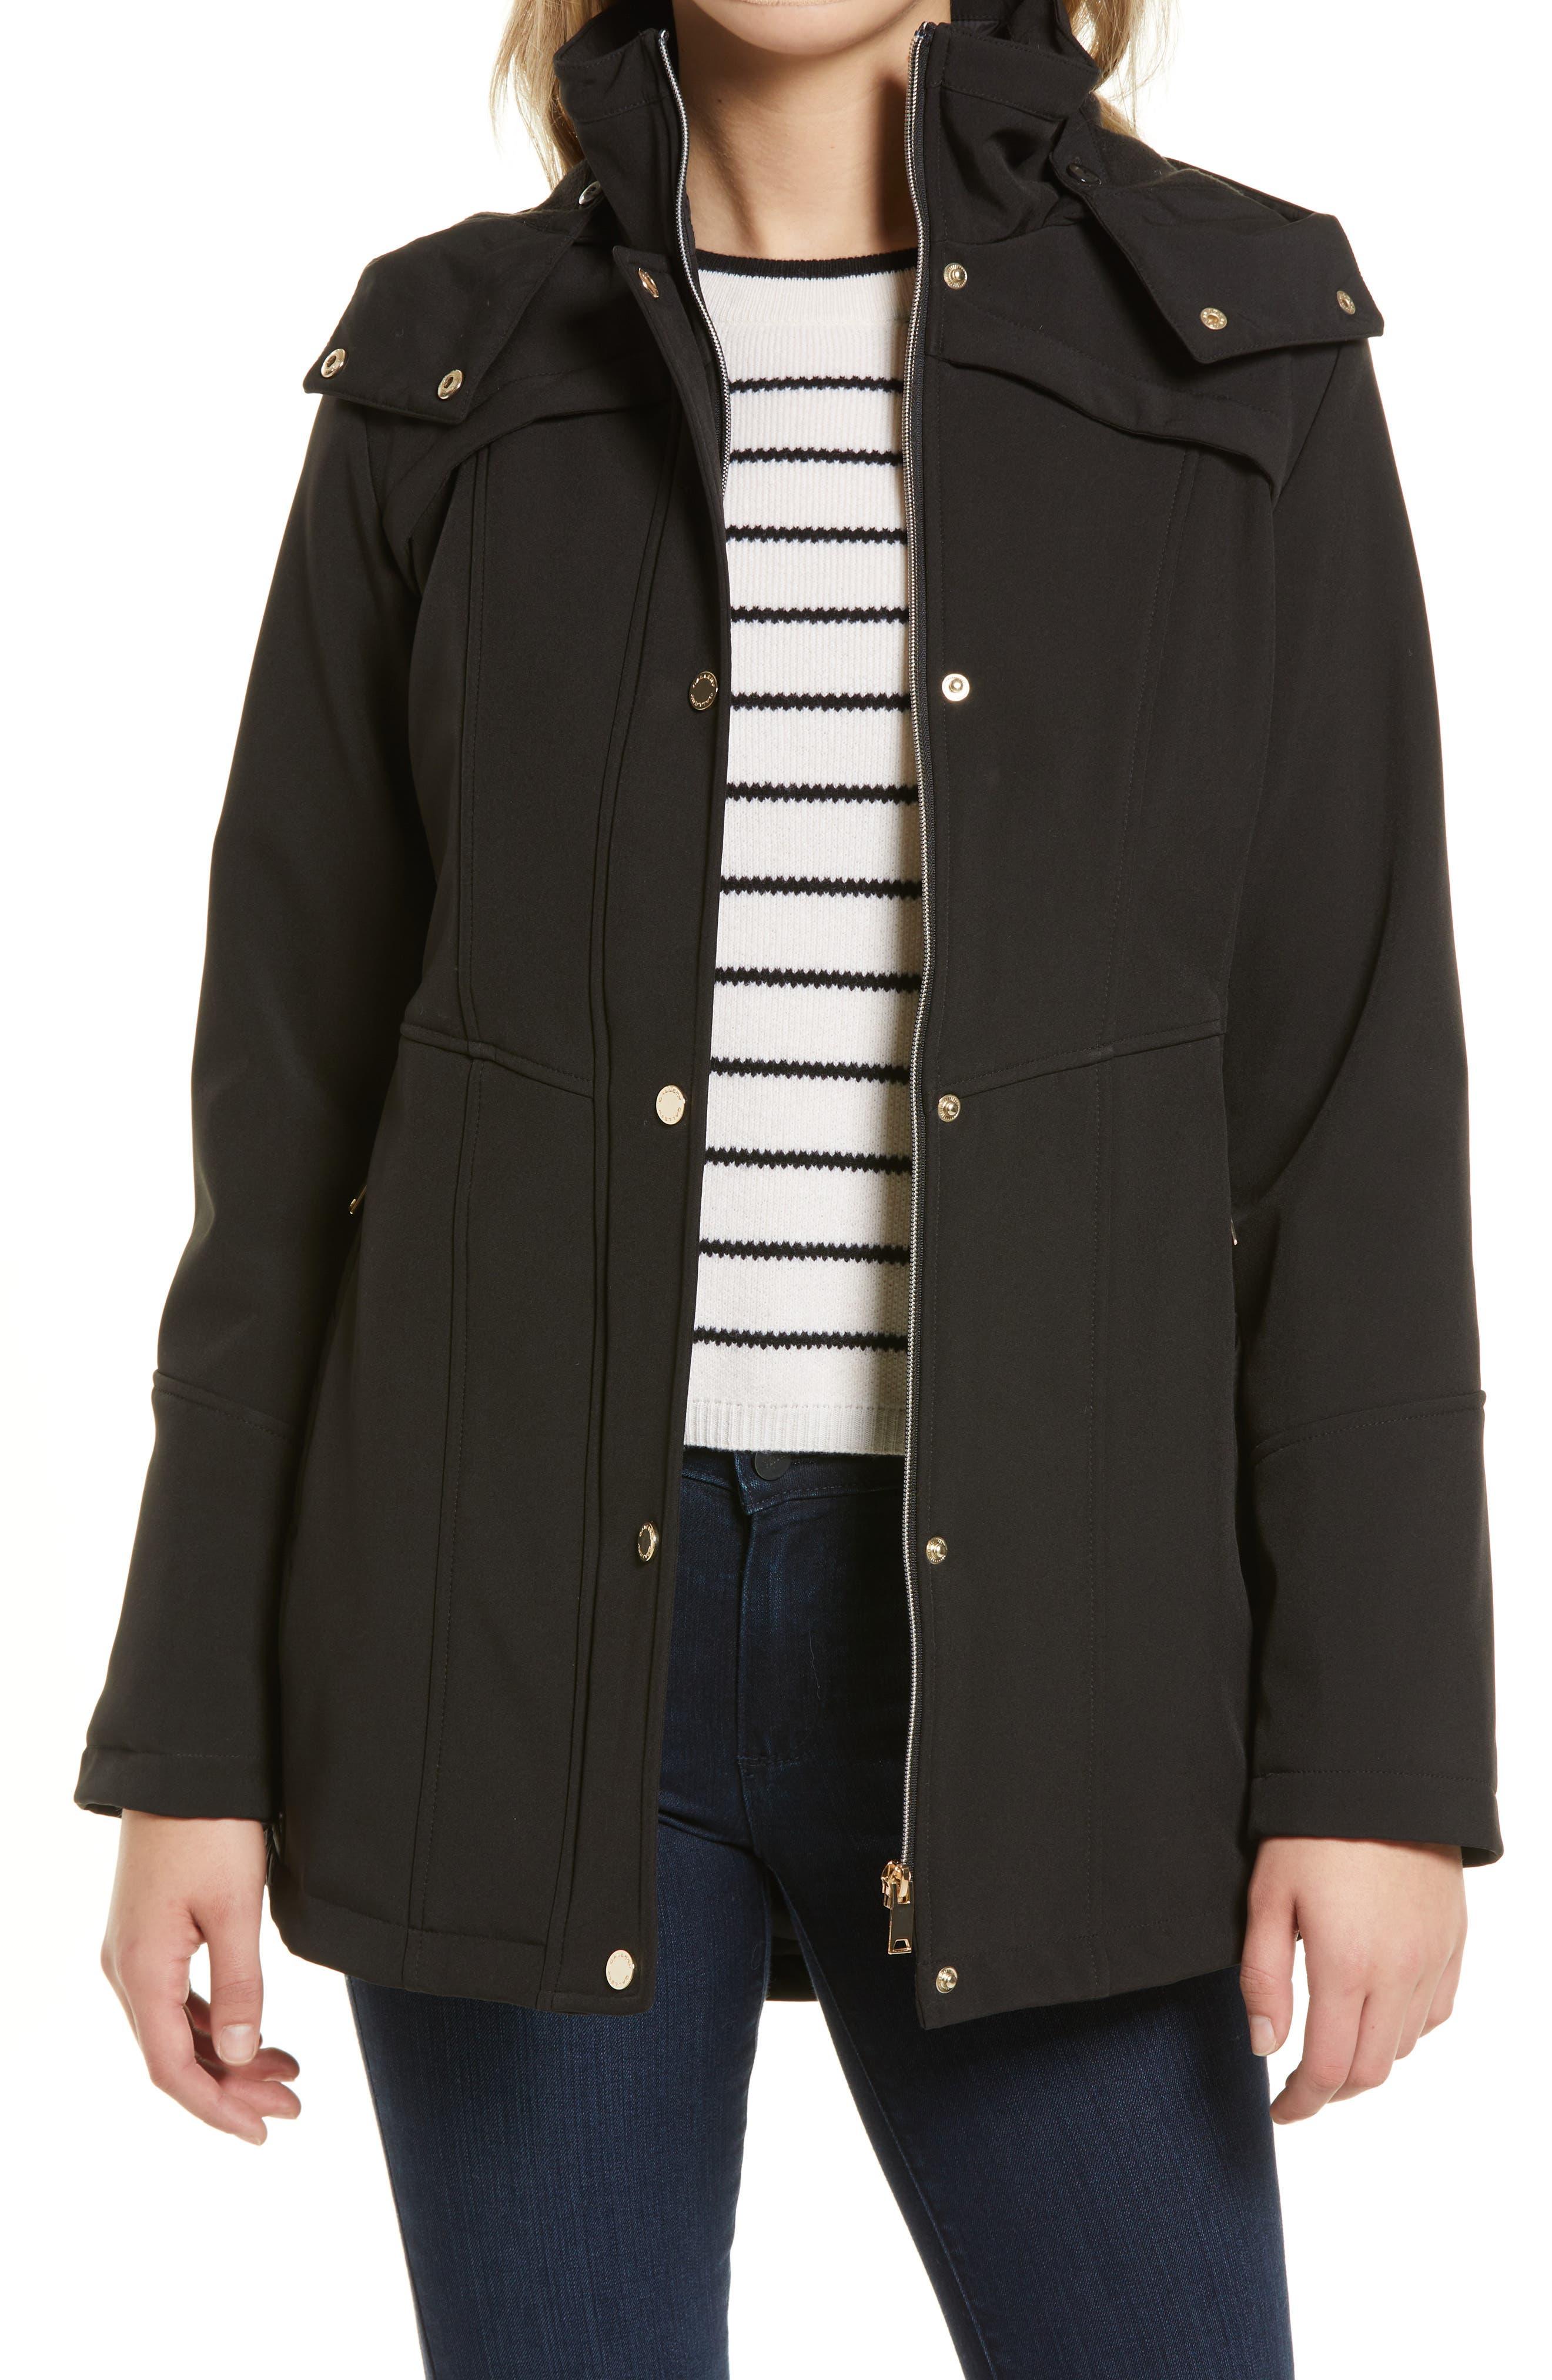 Women's Hooded Soft Shell Raincoat